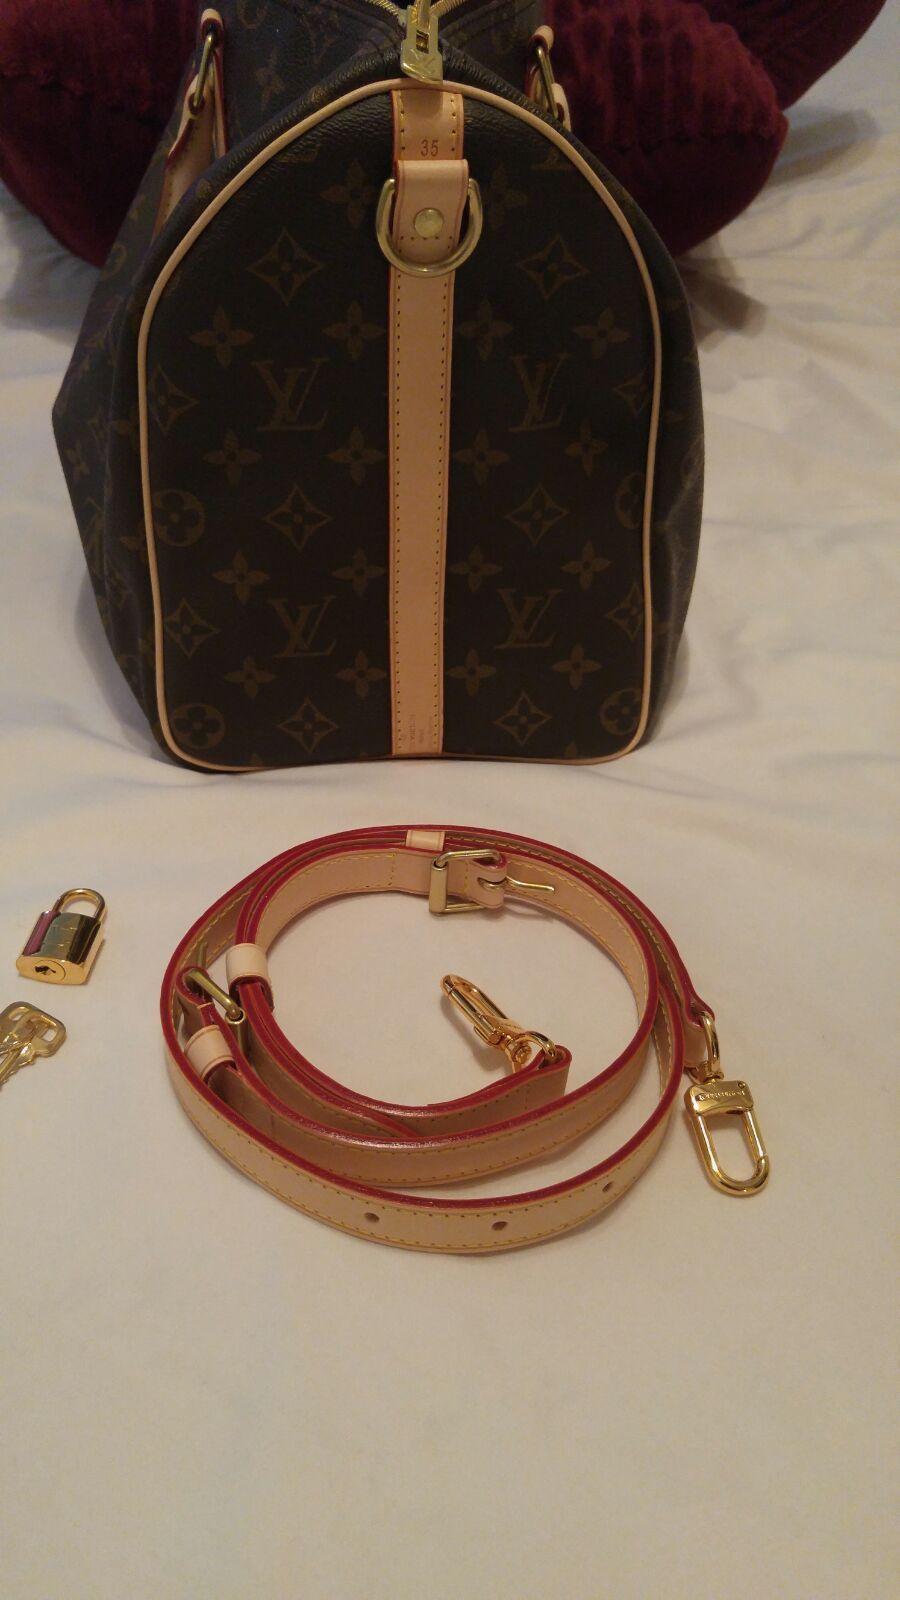 Louis Vuitton Bandouliere Speedy 35